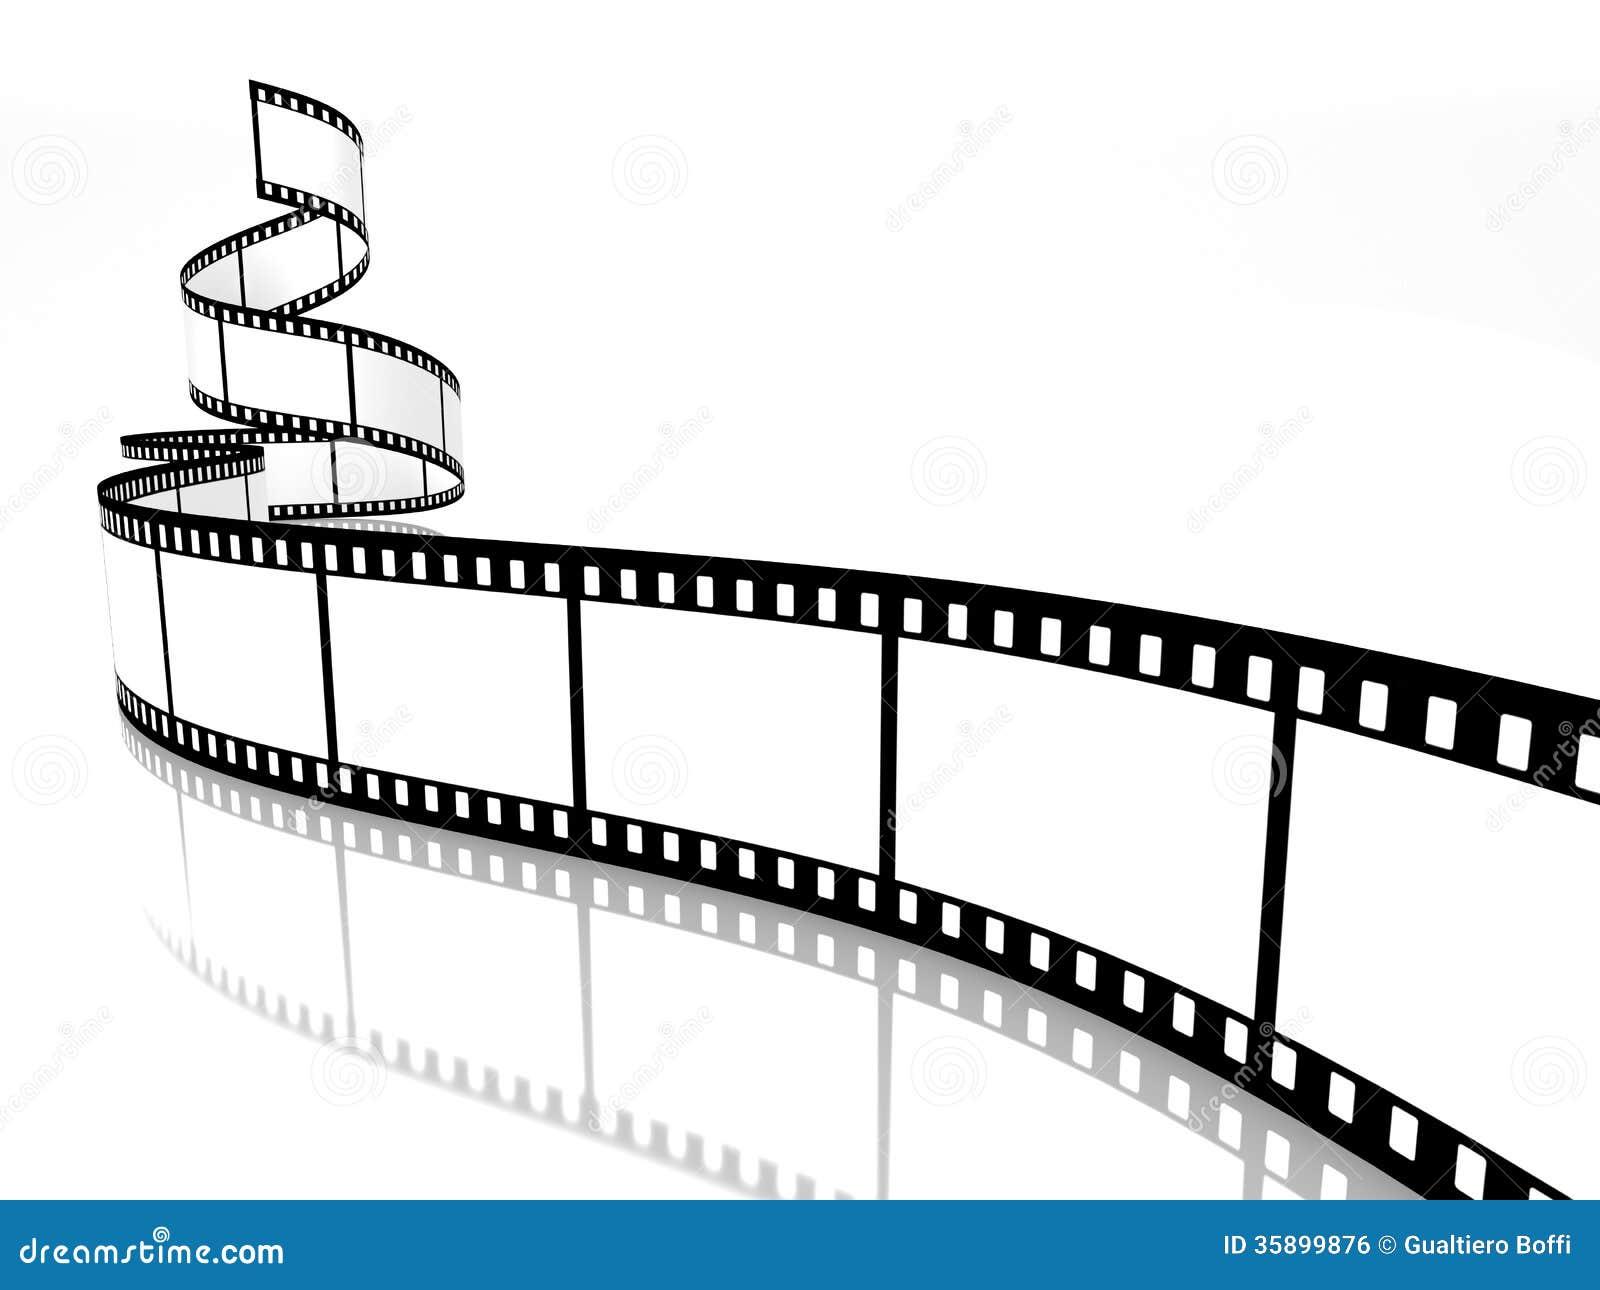 Film Strip Royalty Free Stock Image - Image: 35899876